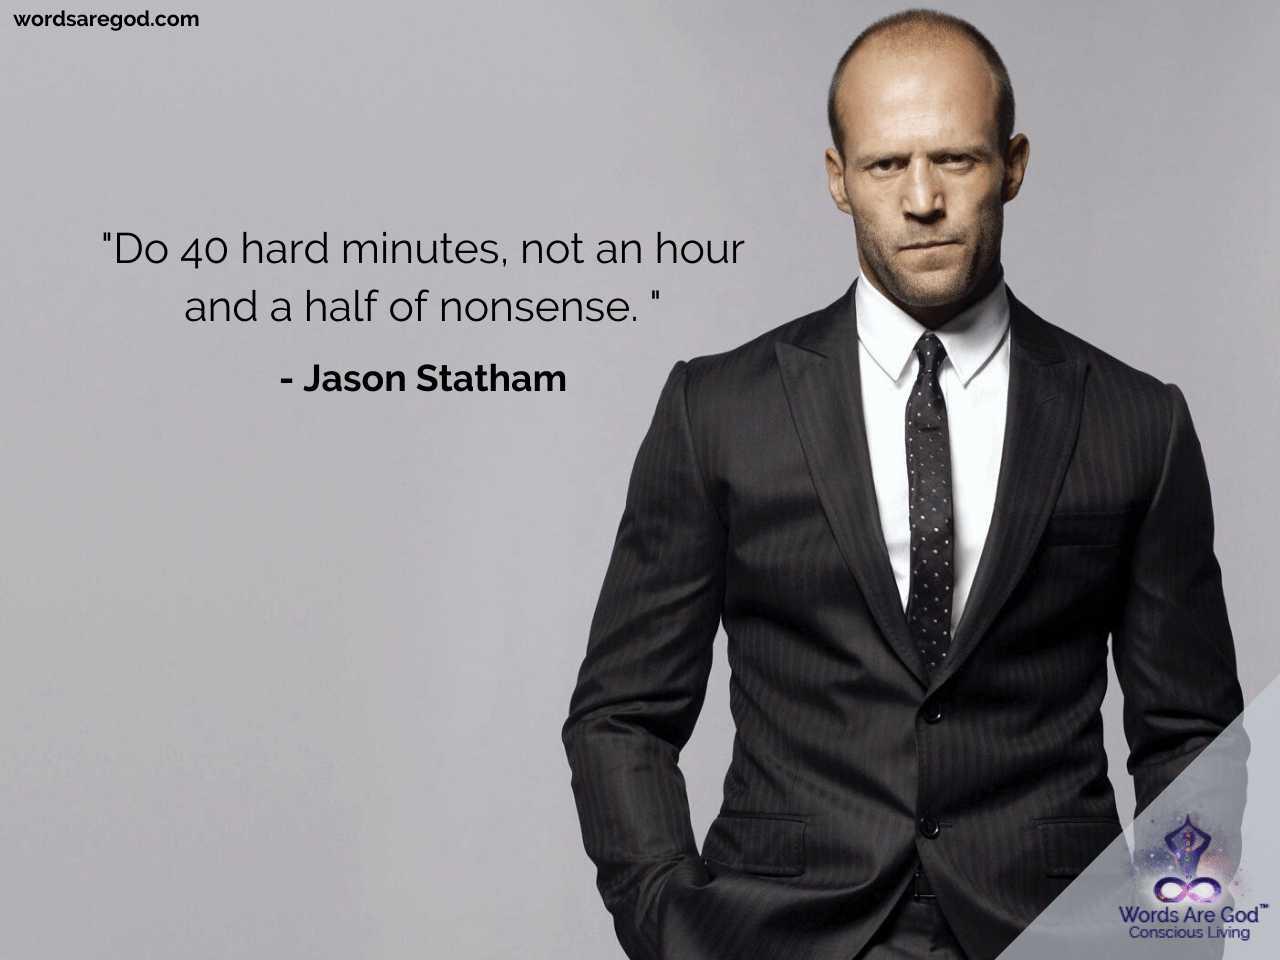 Jason Statham Best Quotes by Jason Statham